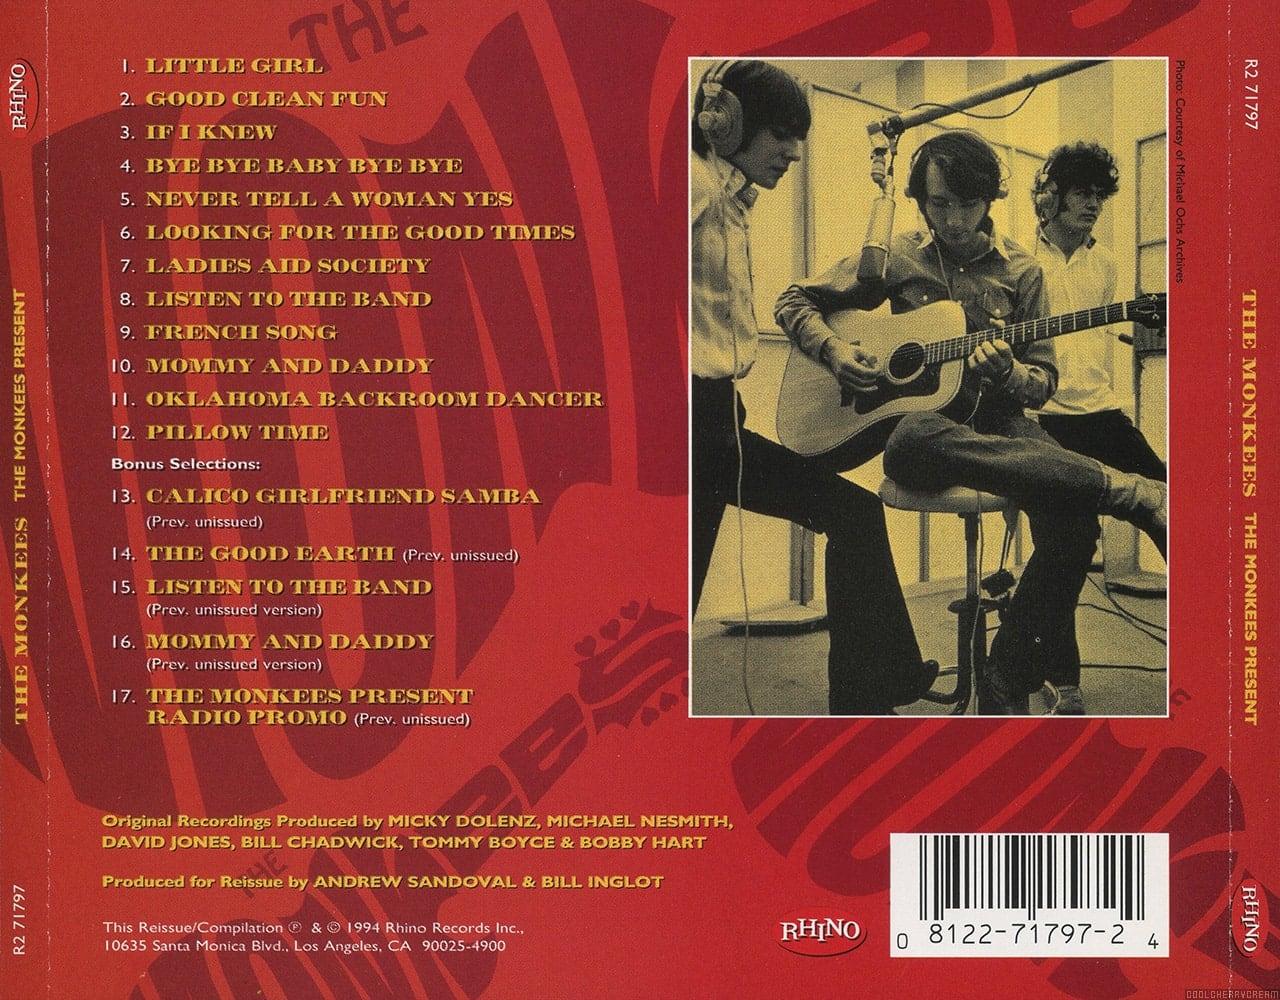 The Monkees Present (1969) Lyrics | The Monkees | Sunshine Factory